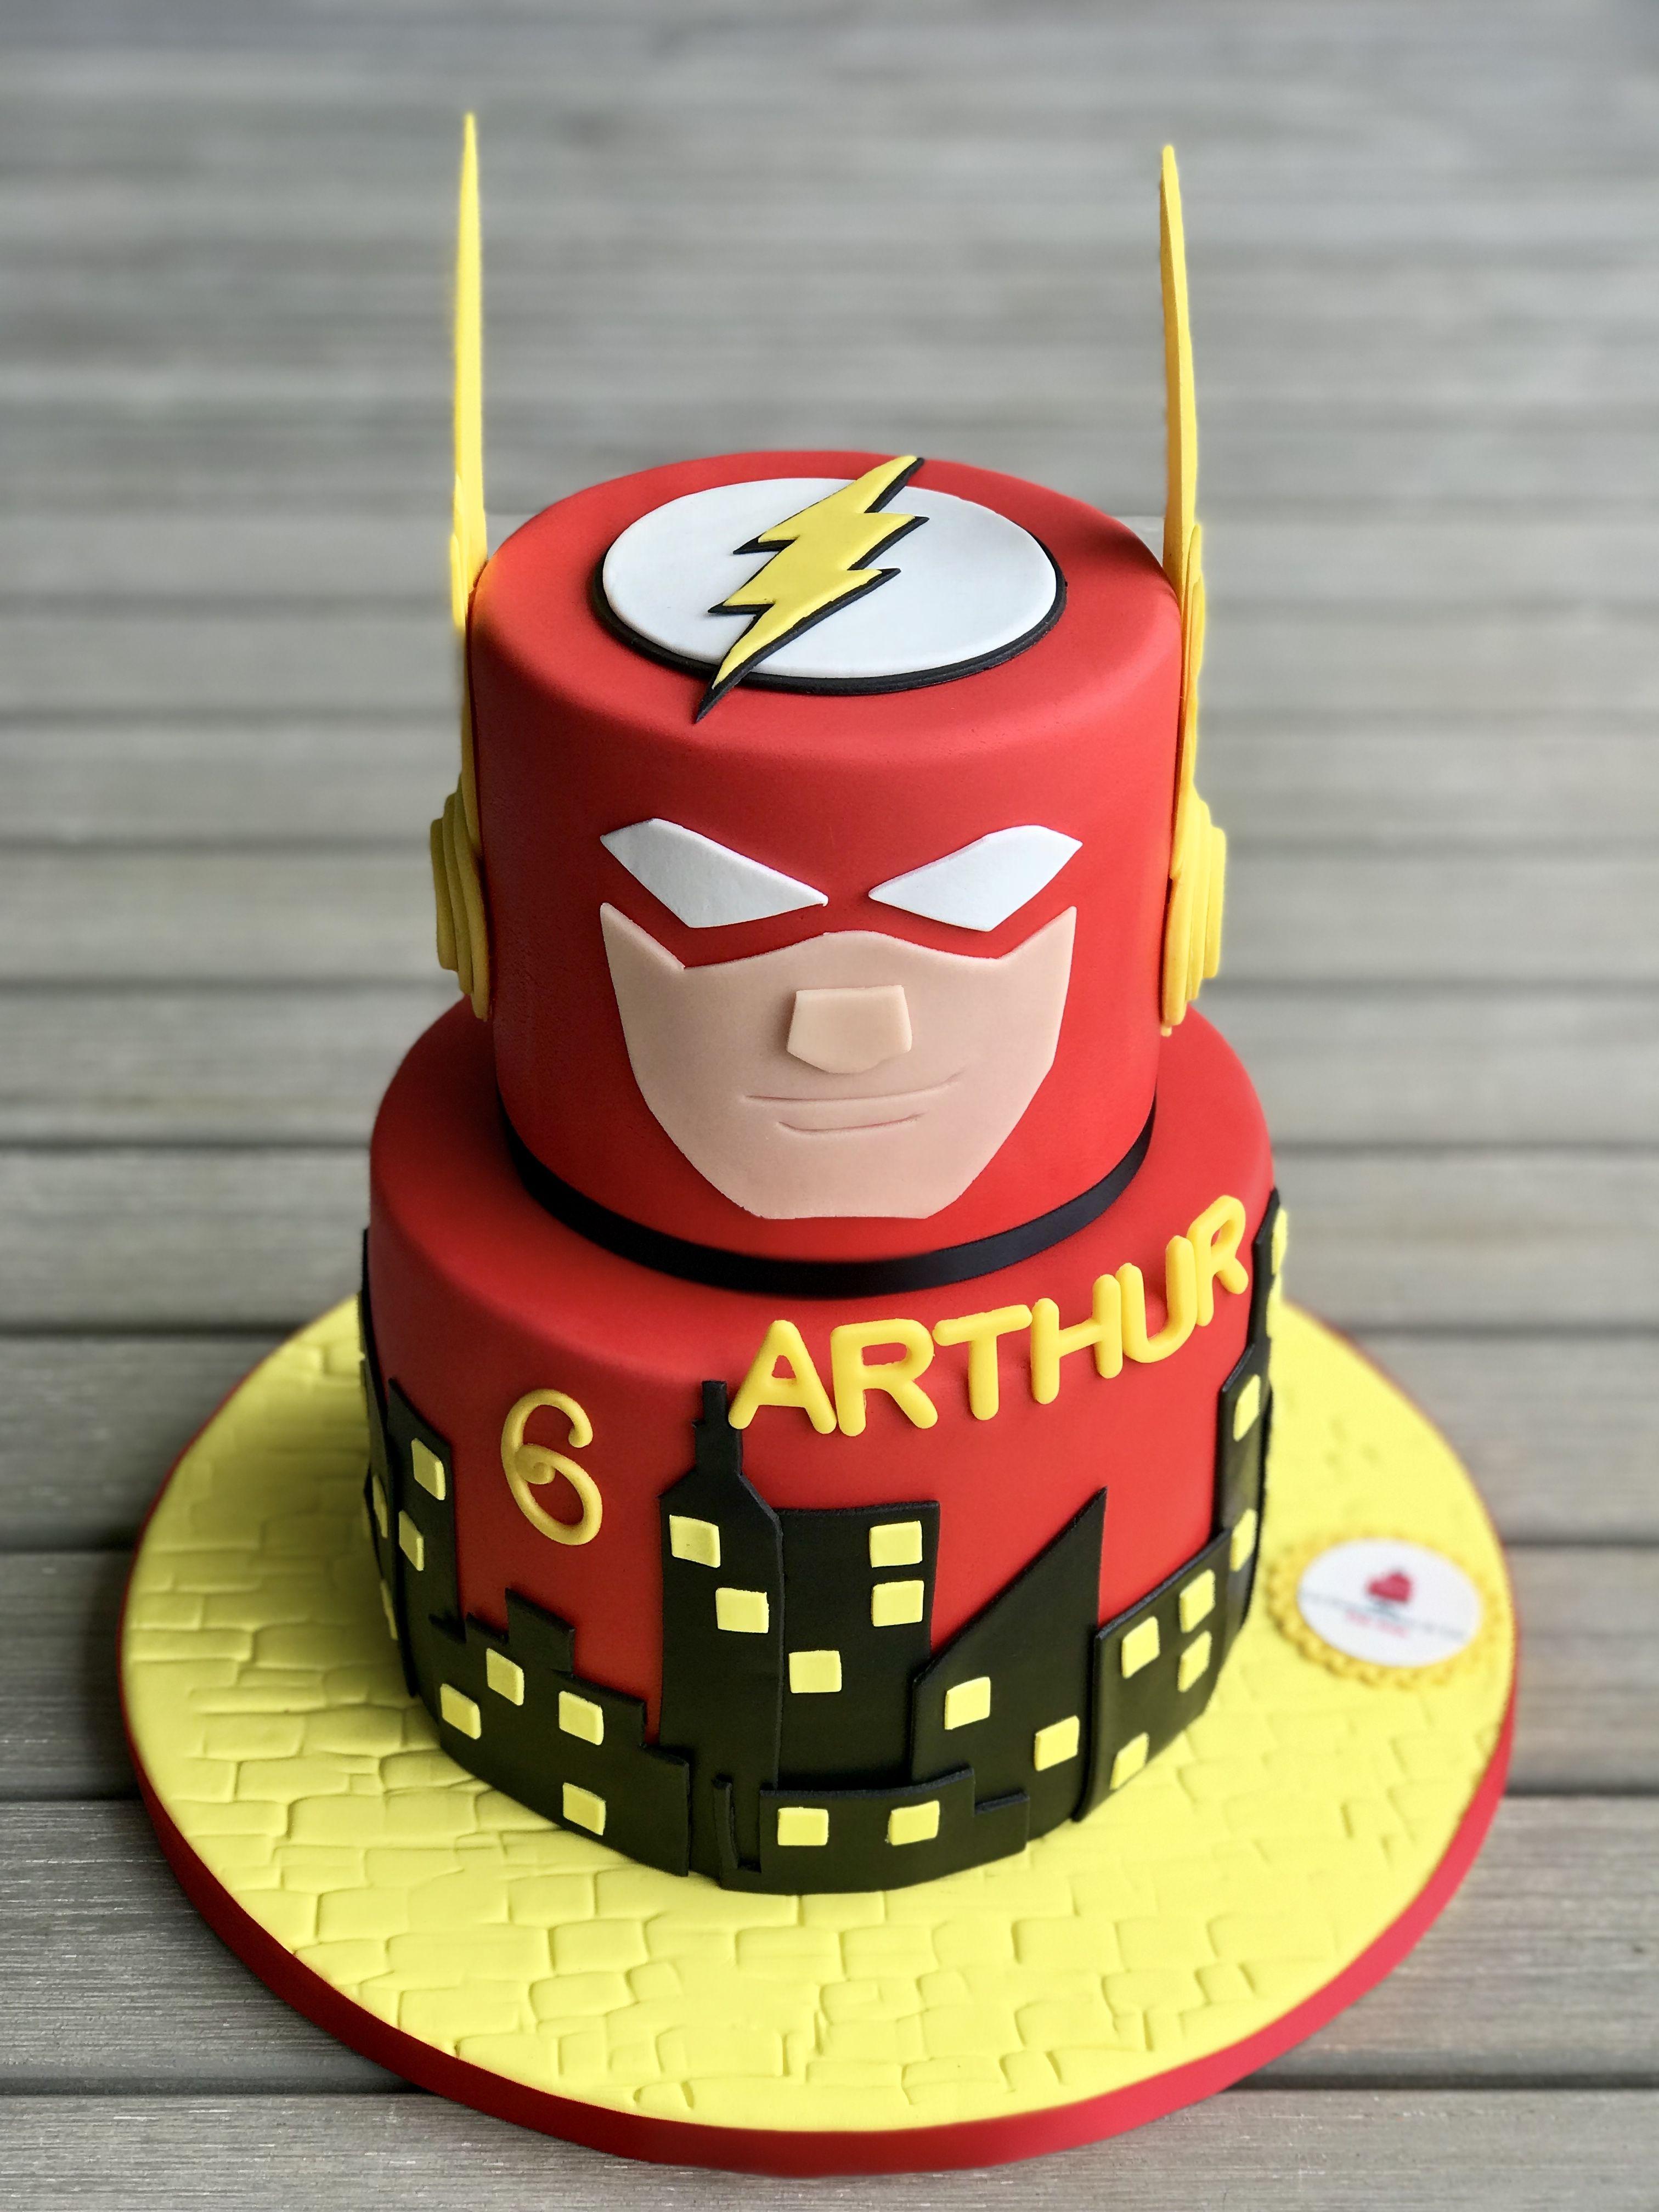 Marvel flash cake | Cakes in 2019 | Flash birthday cake, Flash cake ...